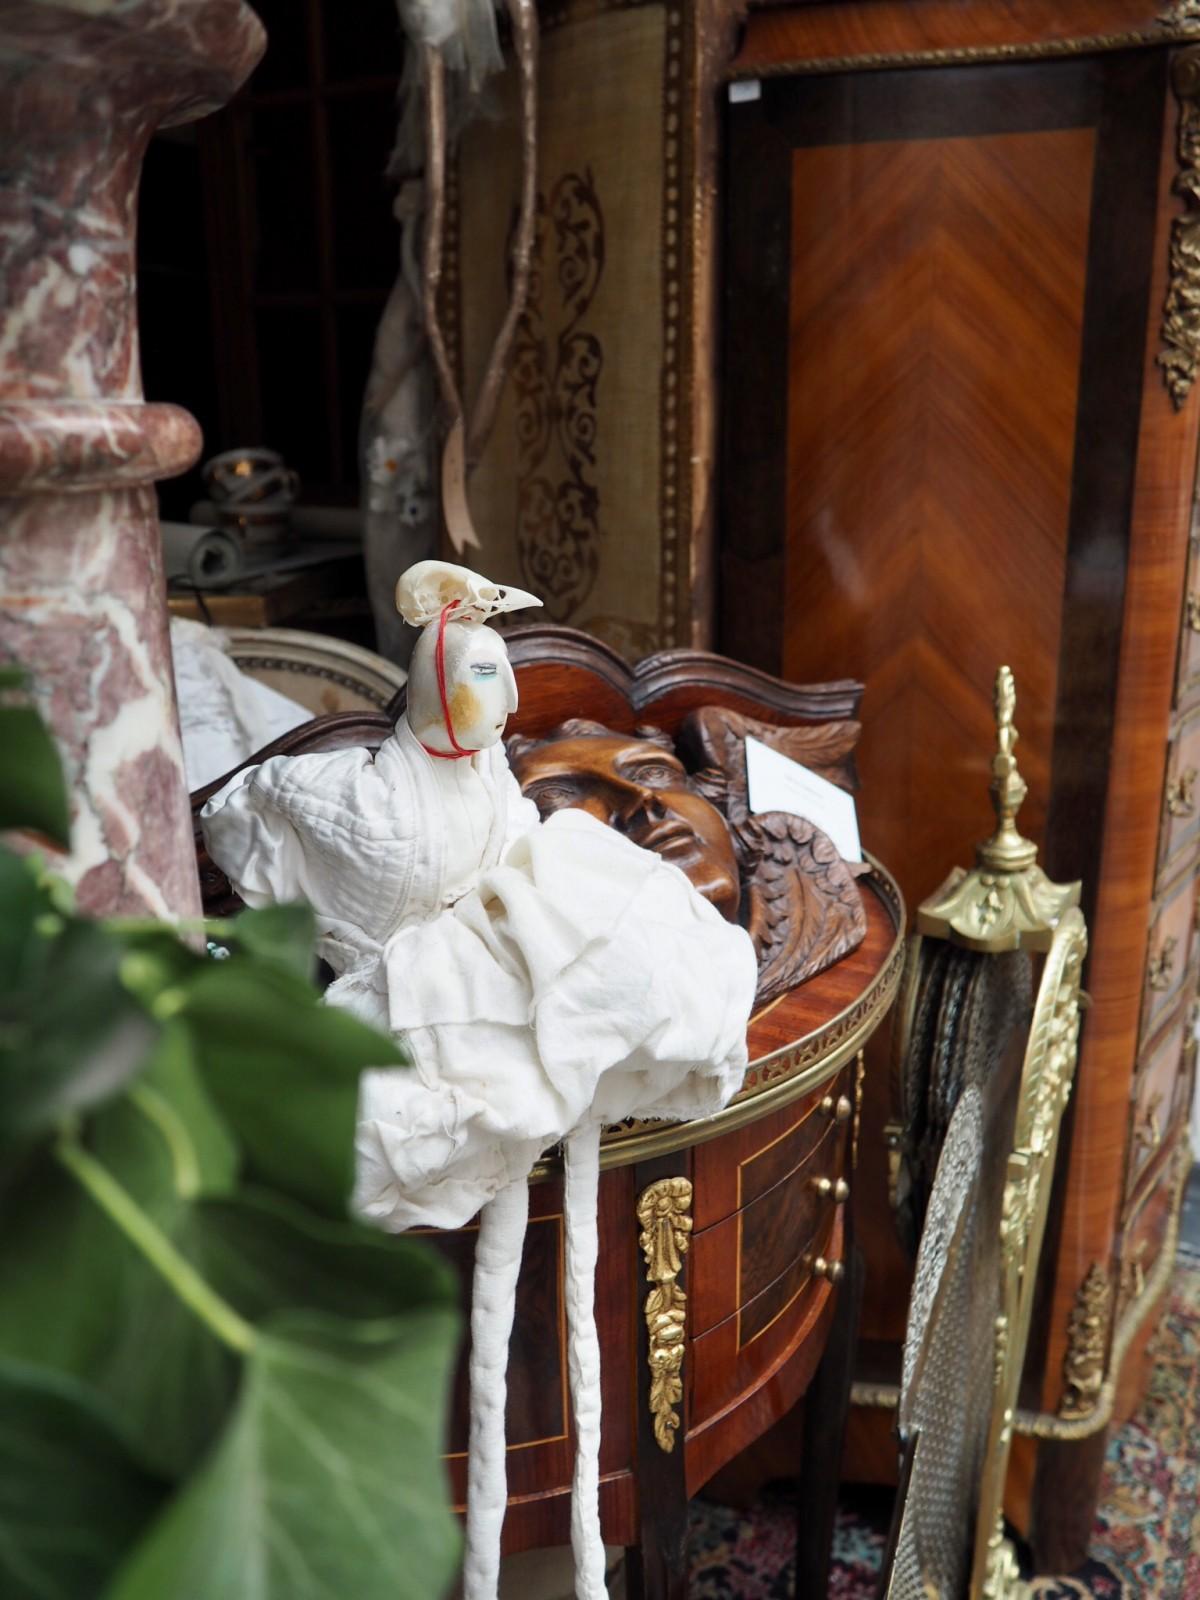 Time stops around Christmas – splendor and elegance at Marche Antique & Le Petit Salon